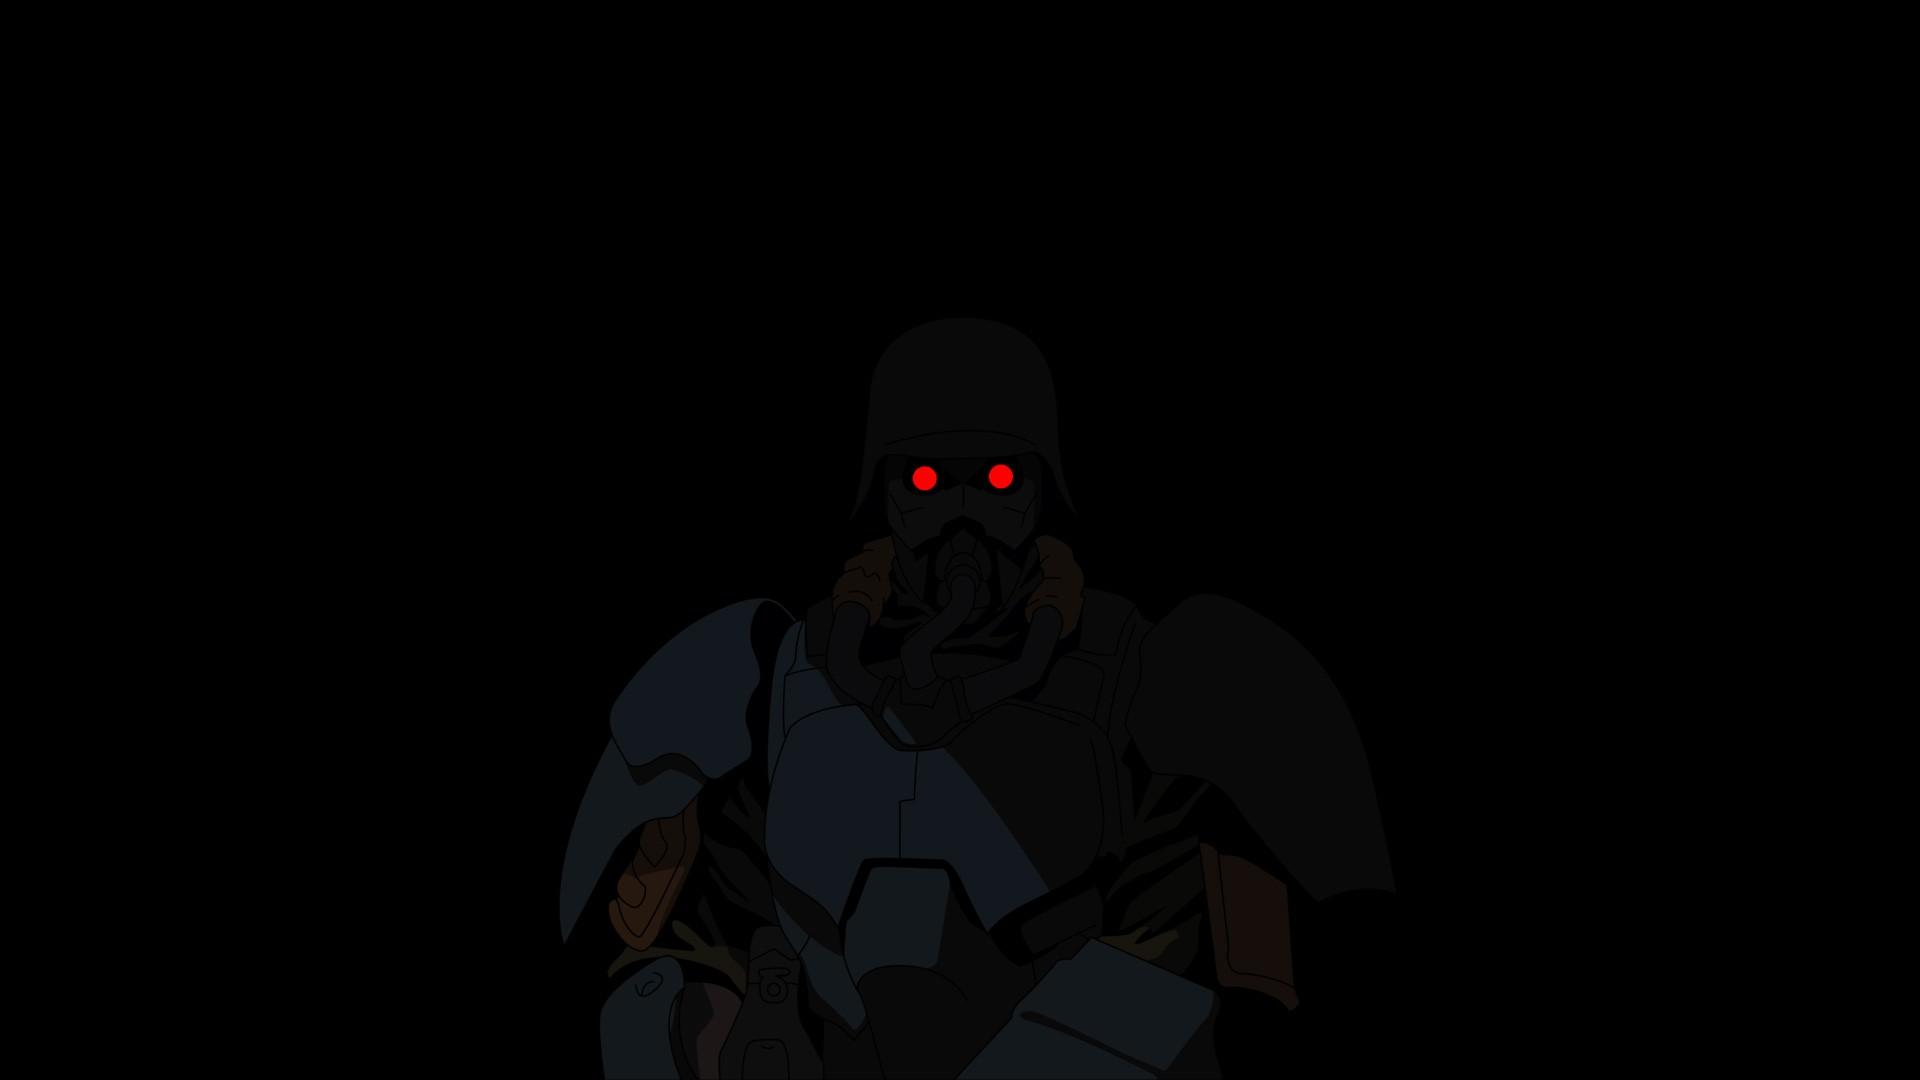 Black Dark Anime Red Eyes Jin Roh Darkness Screens